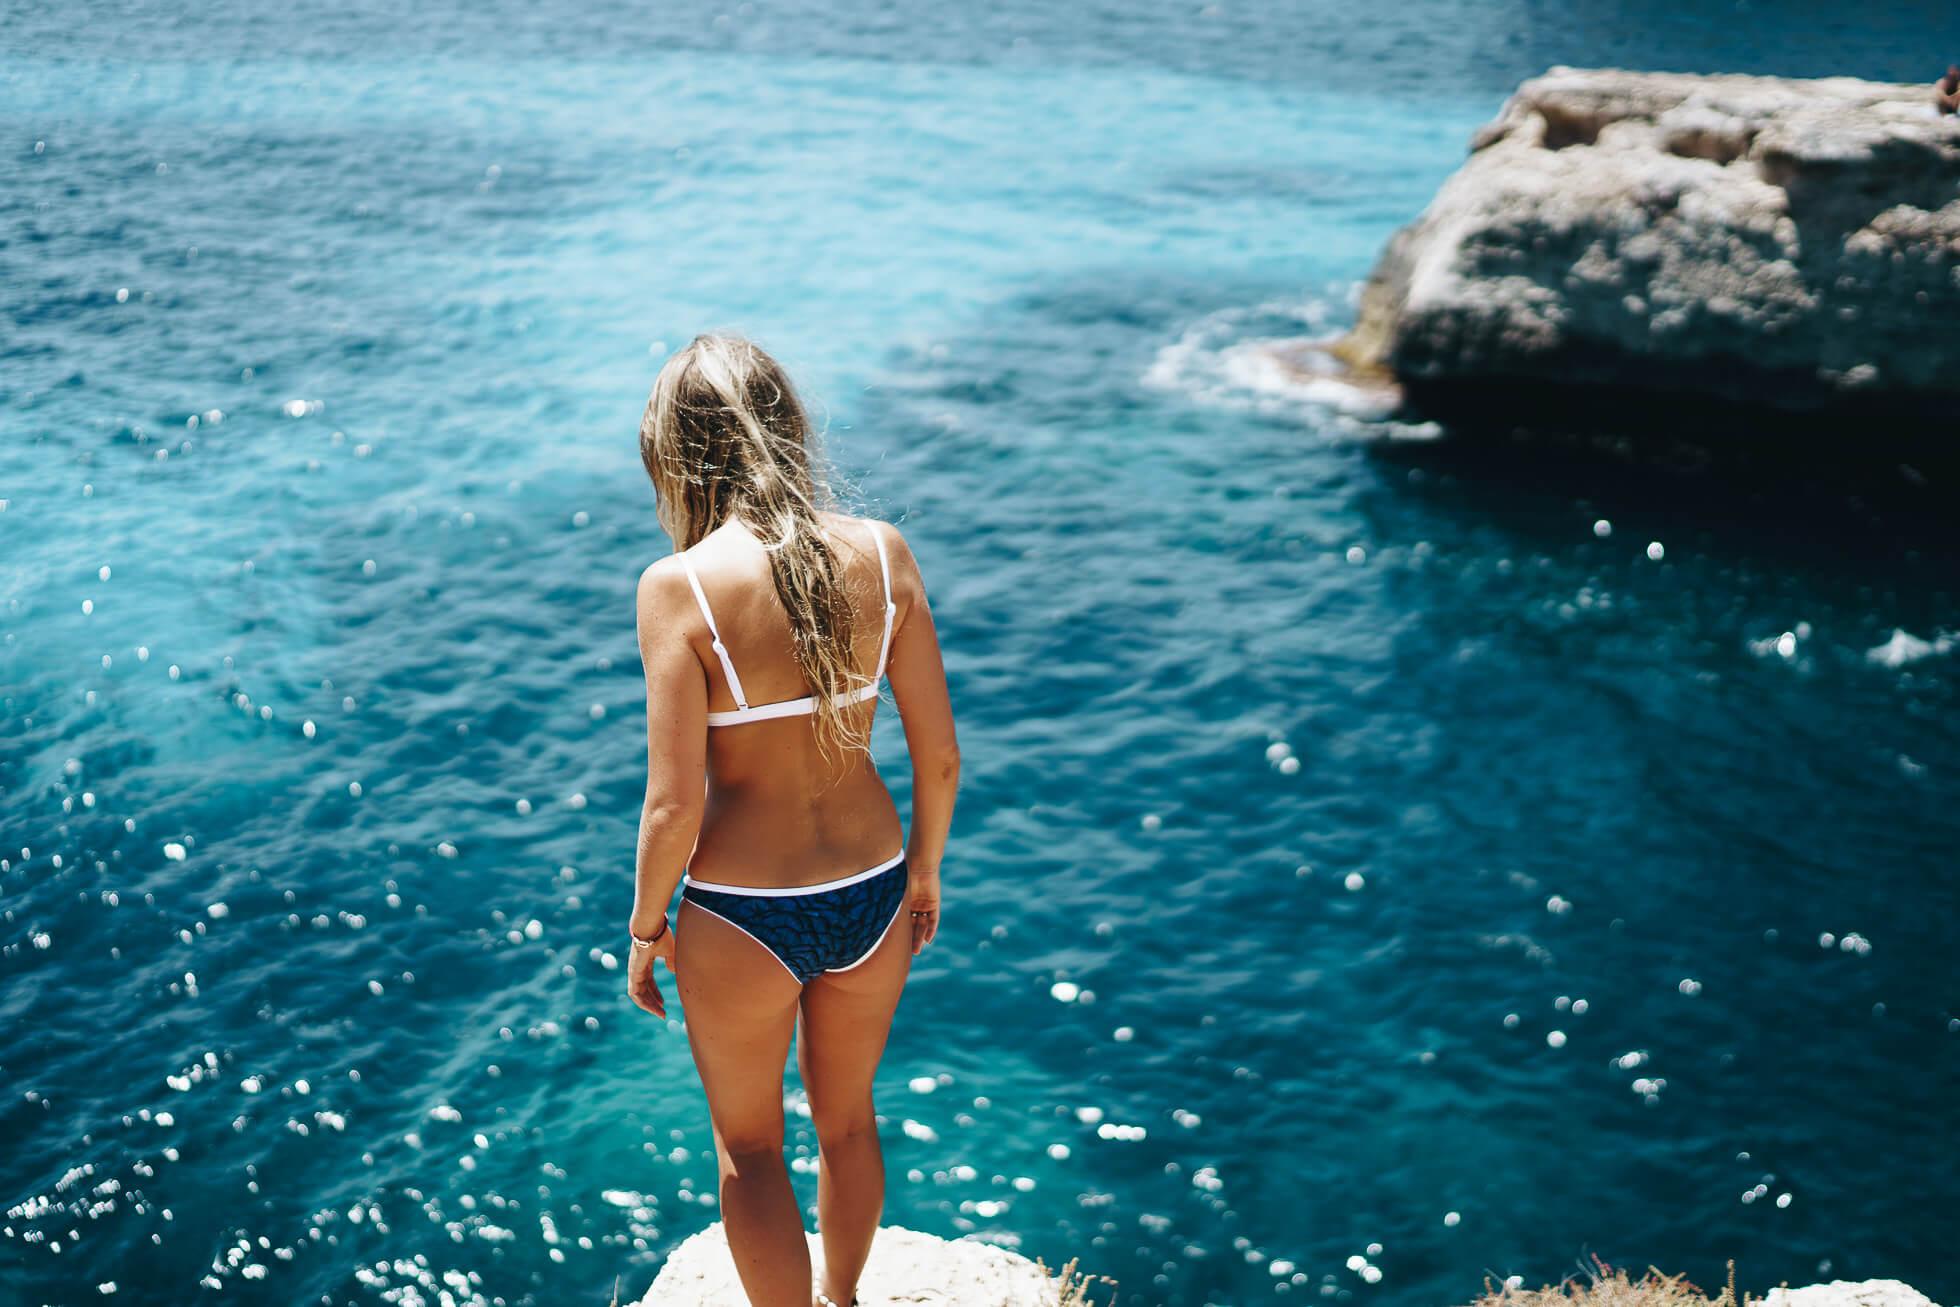 janni-deler-cliff-divingDSC09713